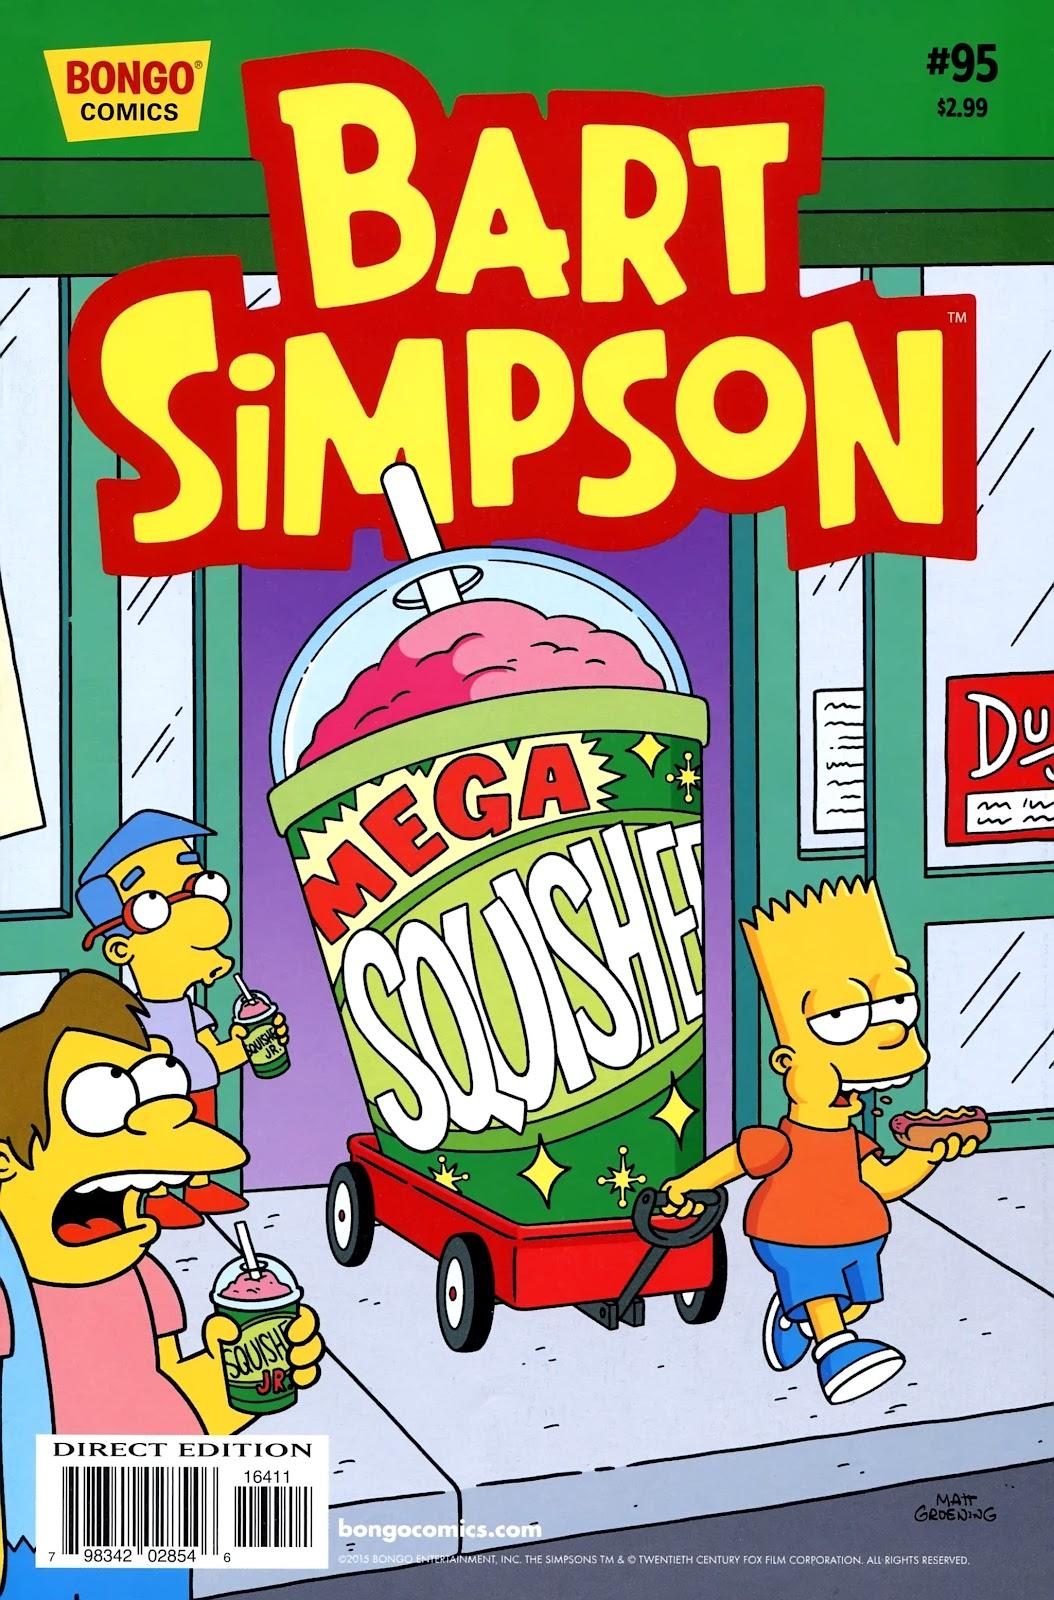 Simpsons Comics Presents Bart Simpson 95 Page 1